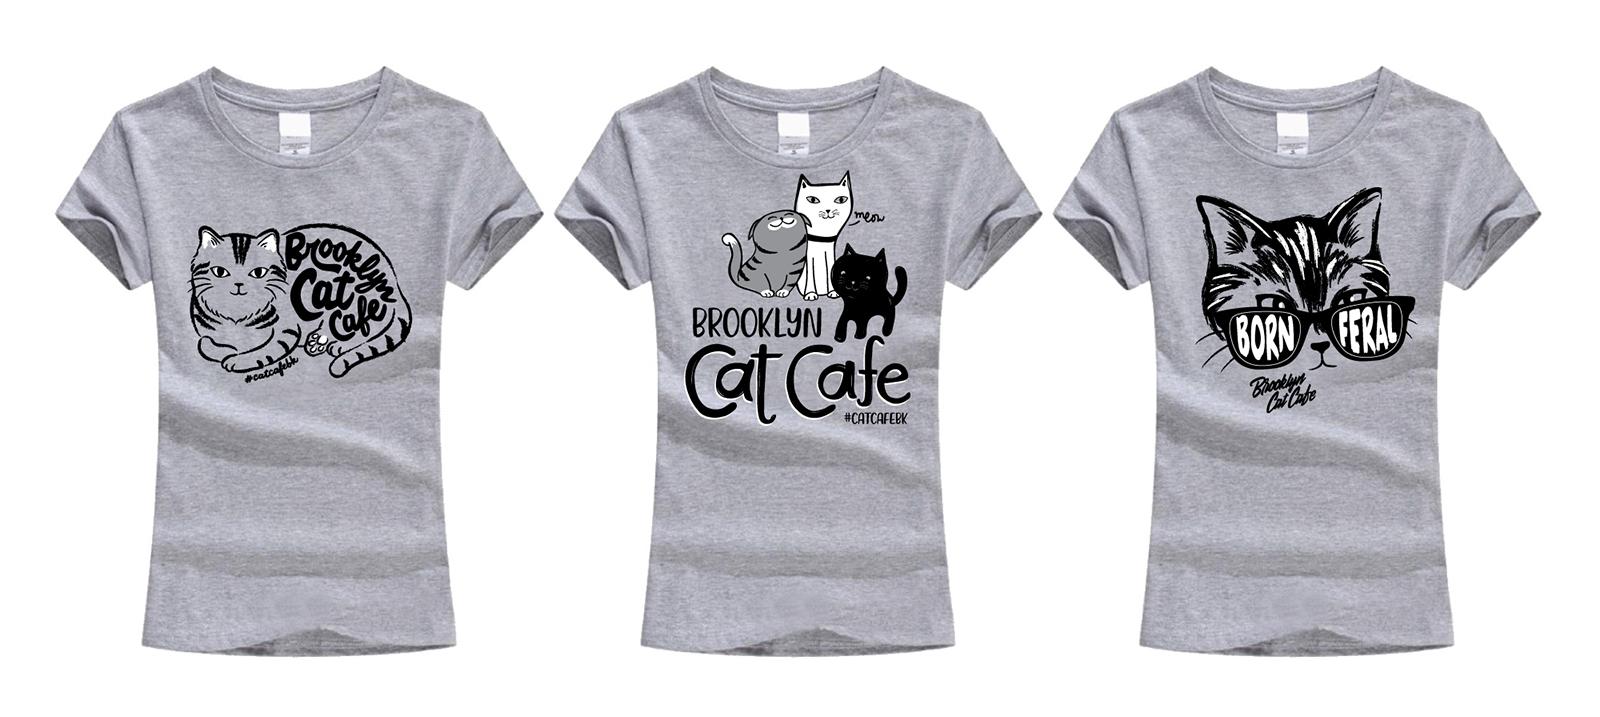 Brooklyn Cat Cafe tee designs